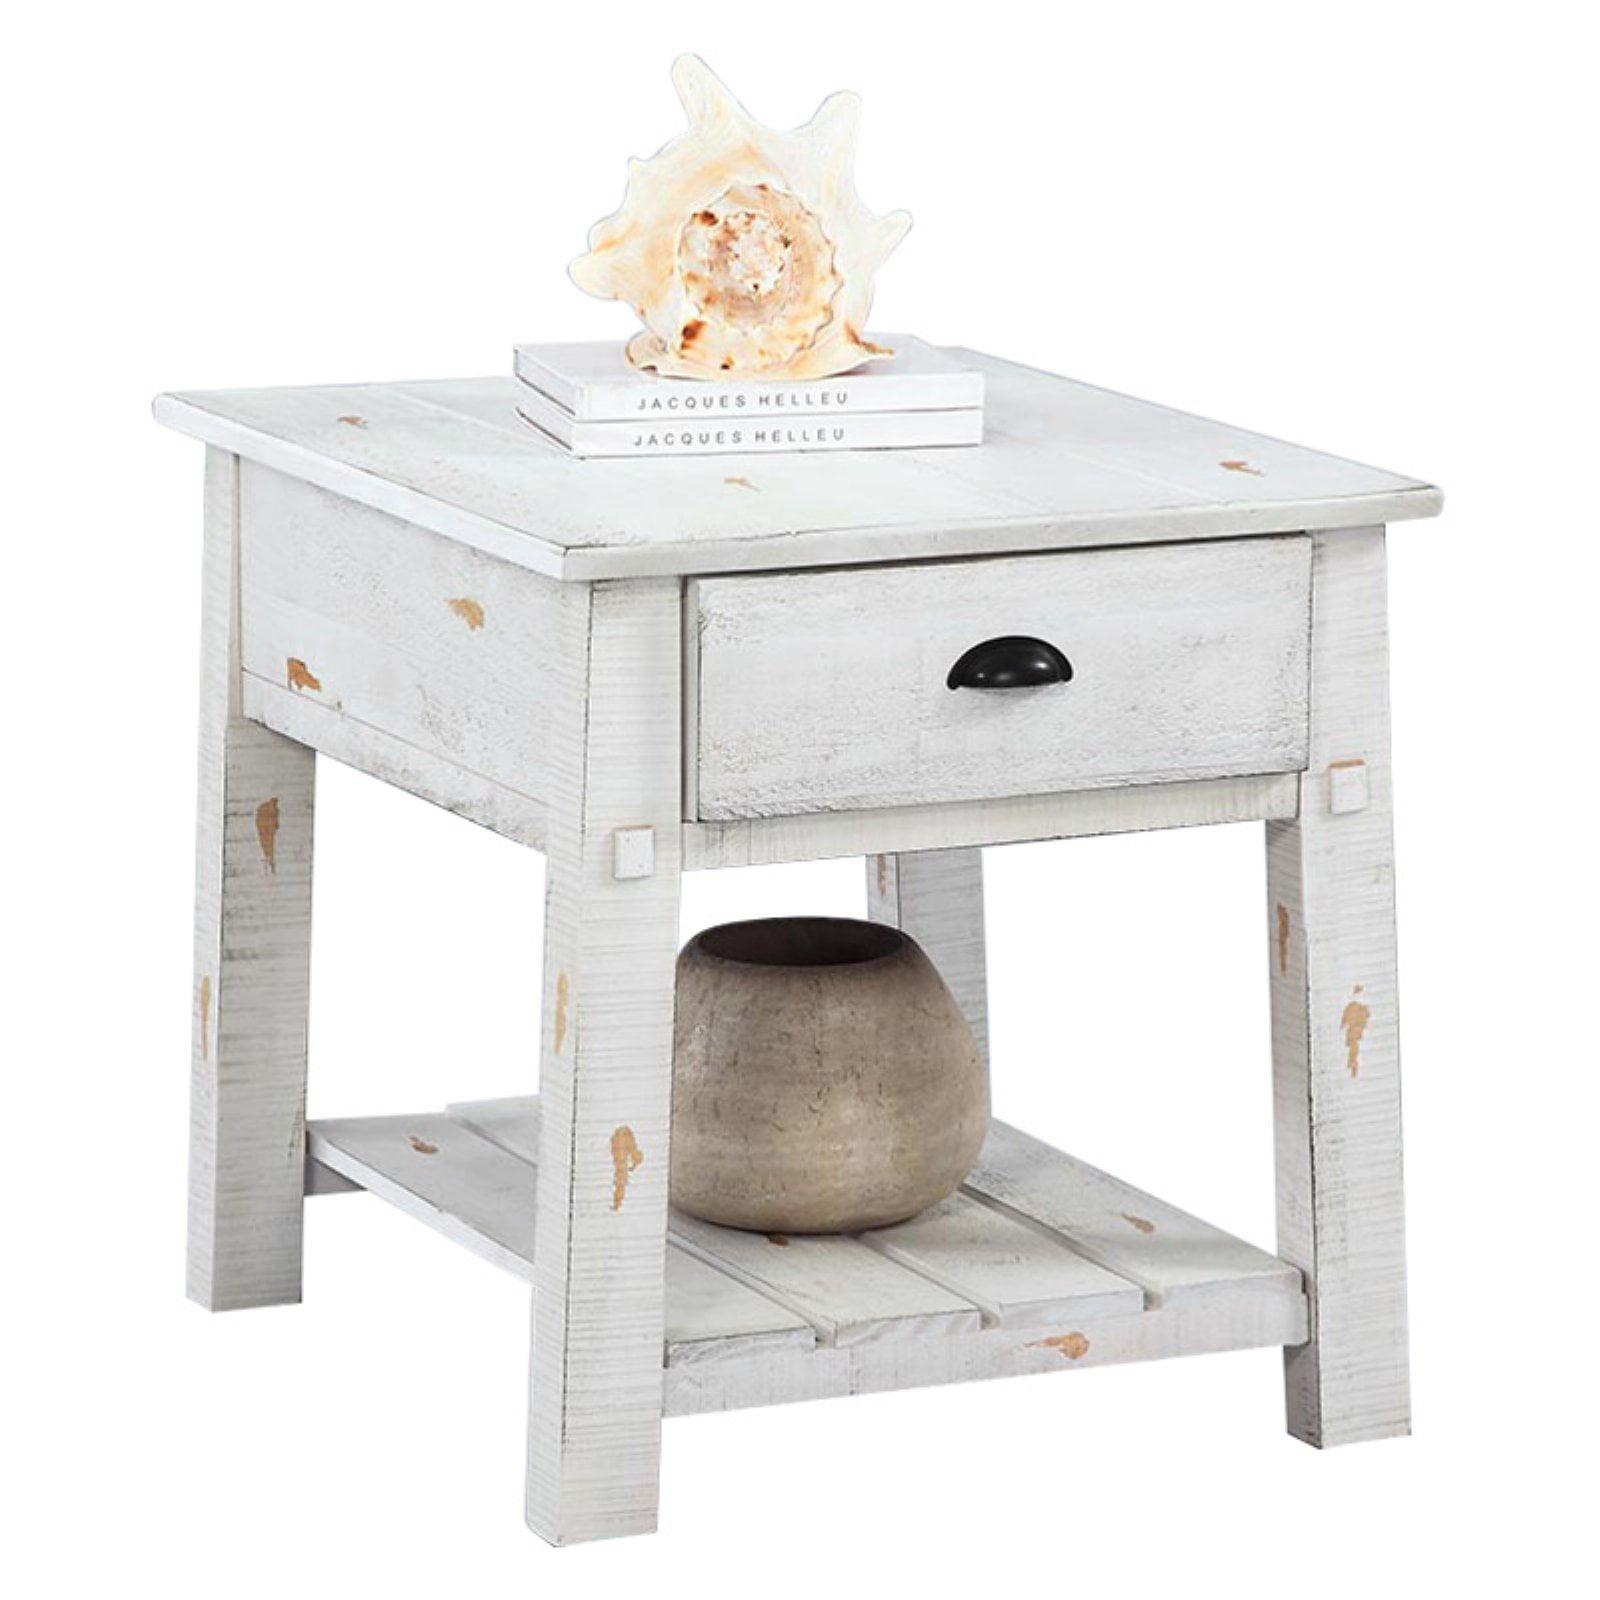 Progressive Willow Rectangular End Table - White